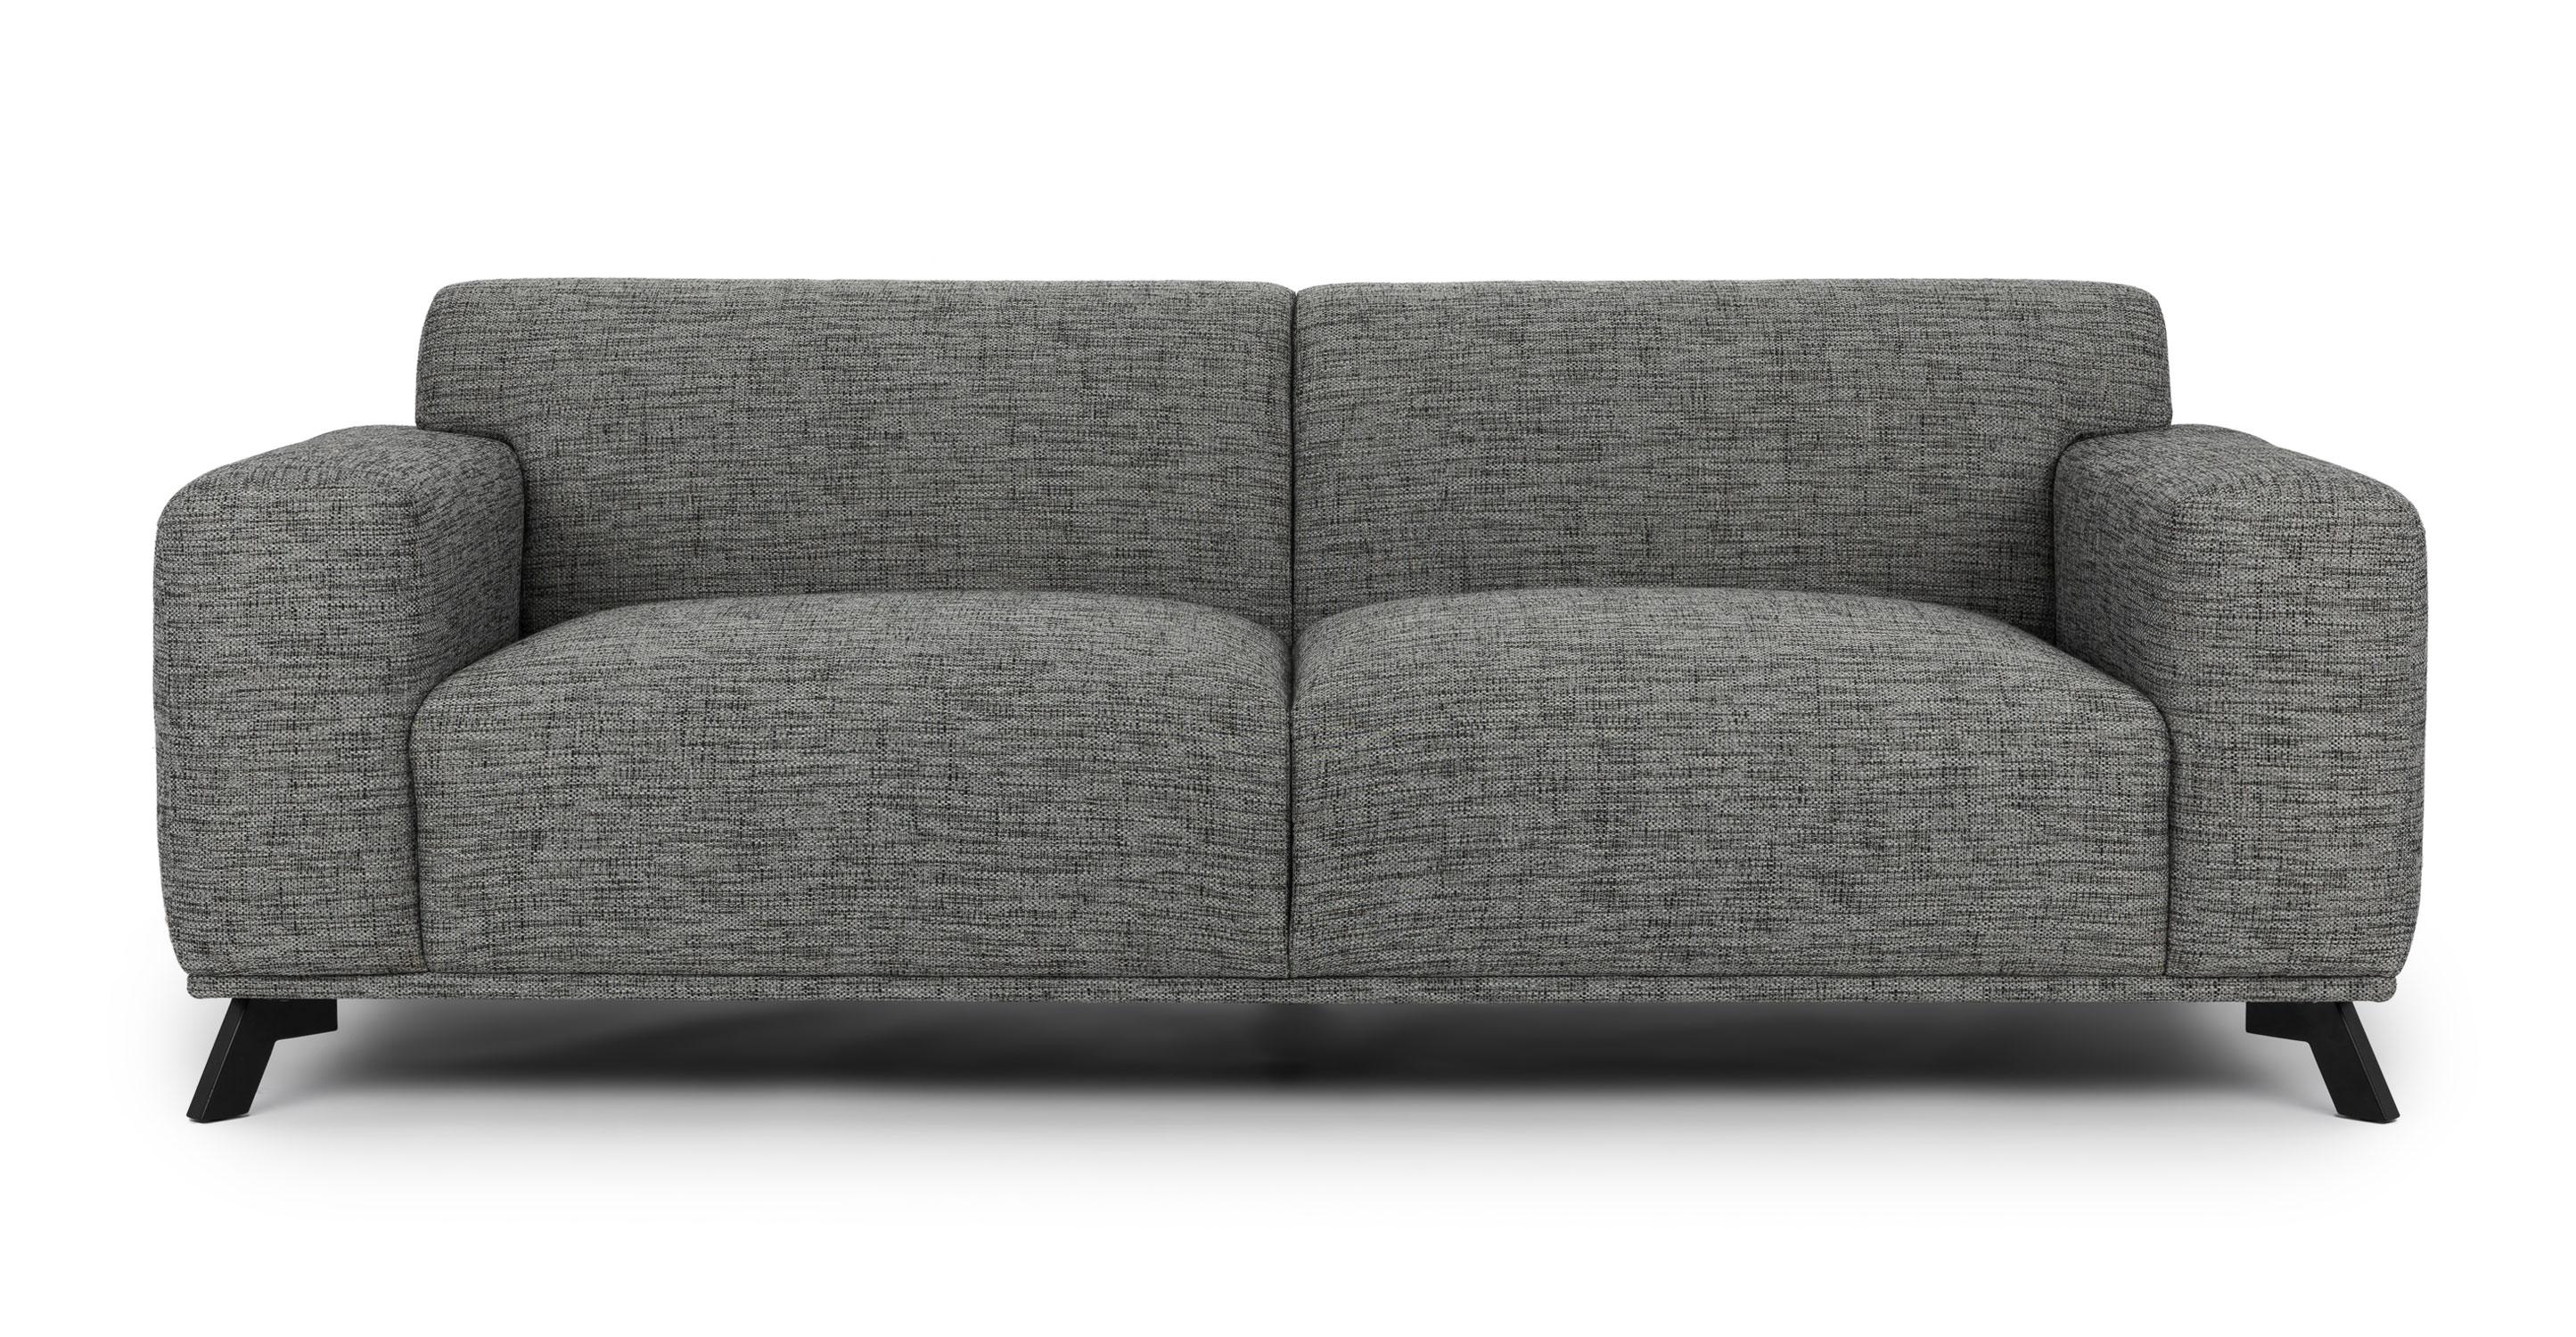 mid century style sofa canada skyline volu licorice cream - sofas article | modern, ...